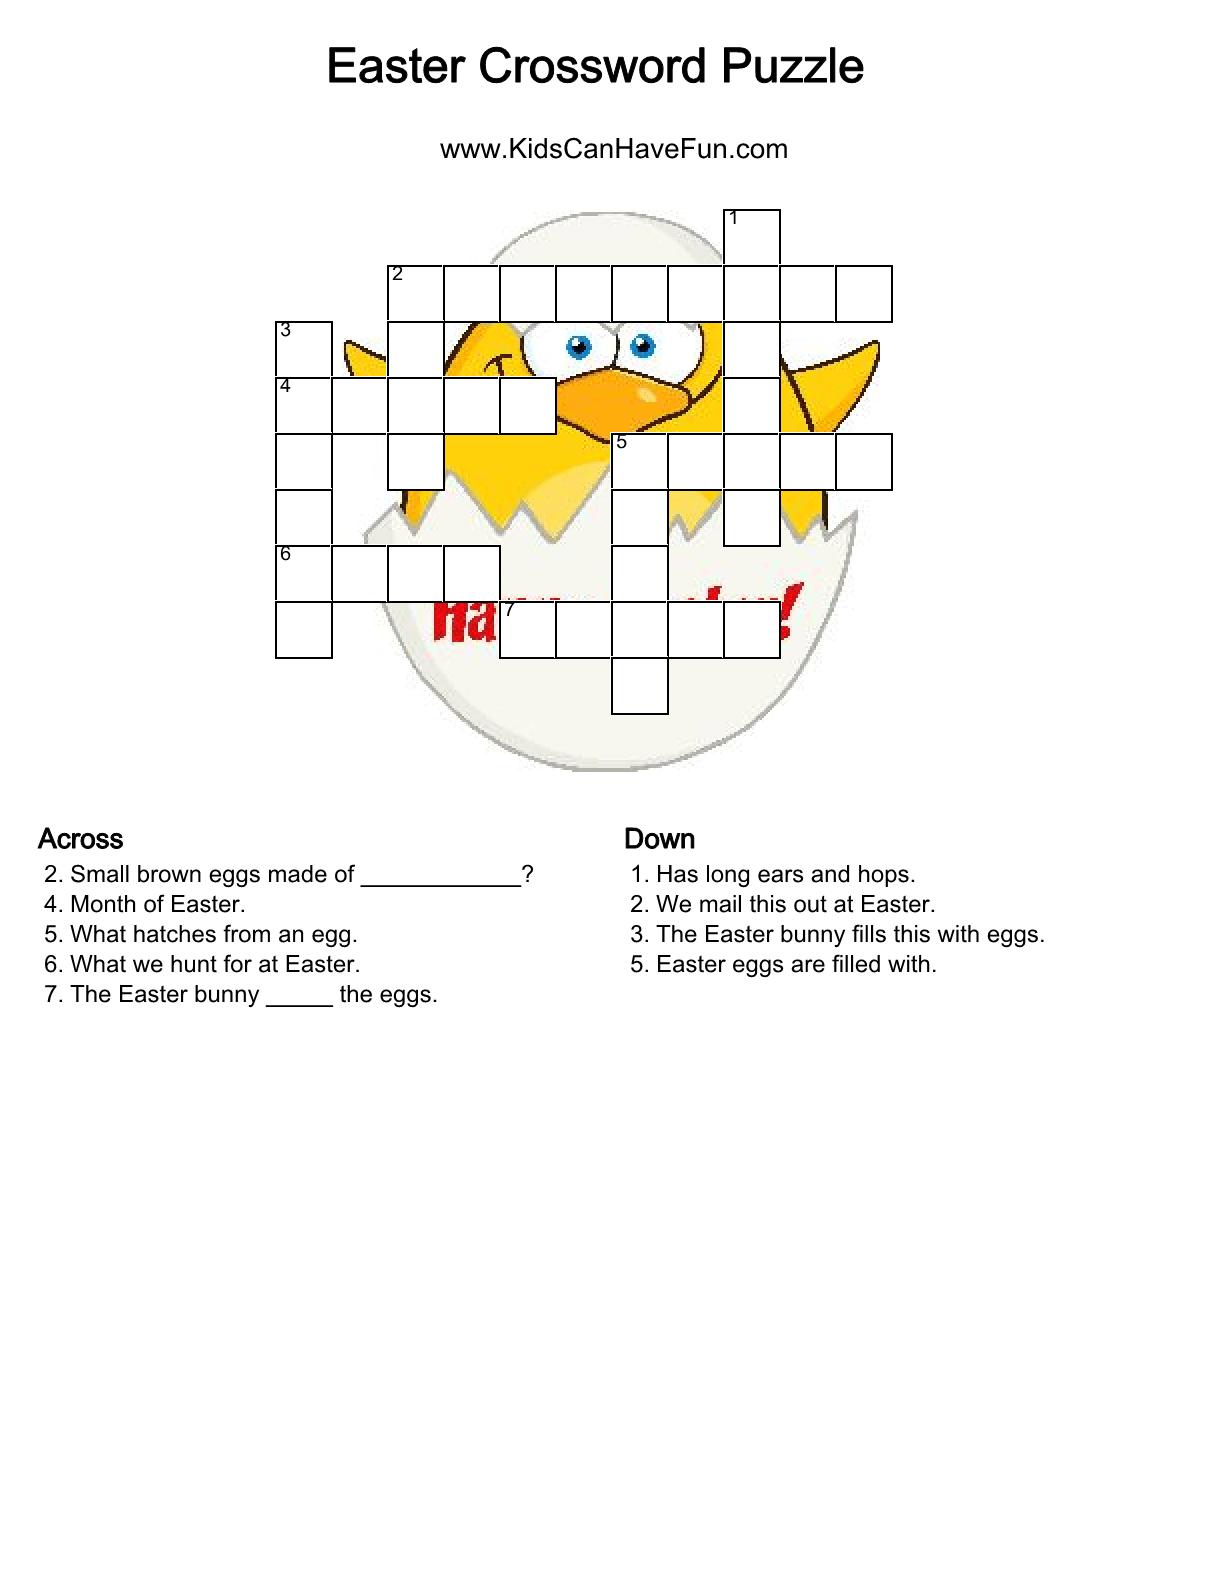 Easter Crossword Puzzle Dscanhavefun